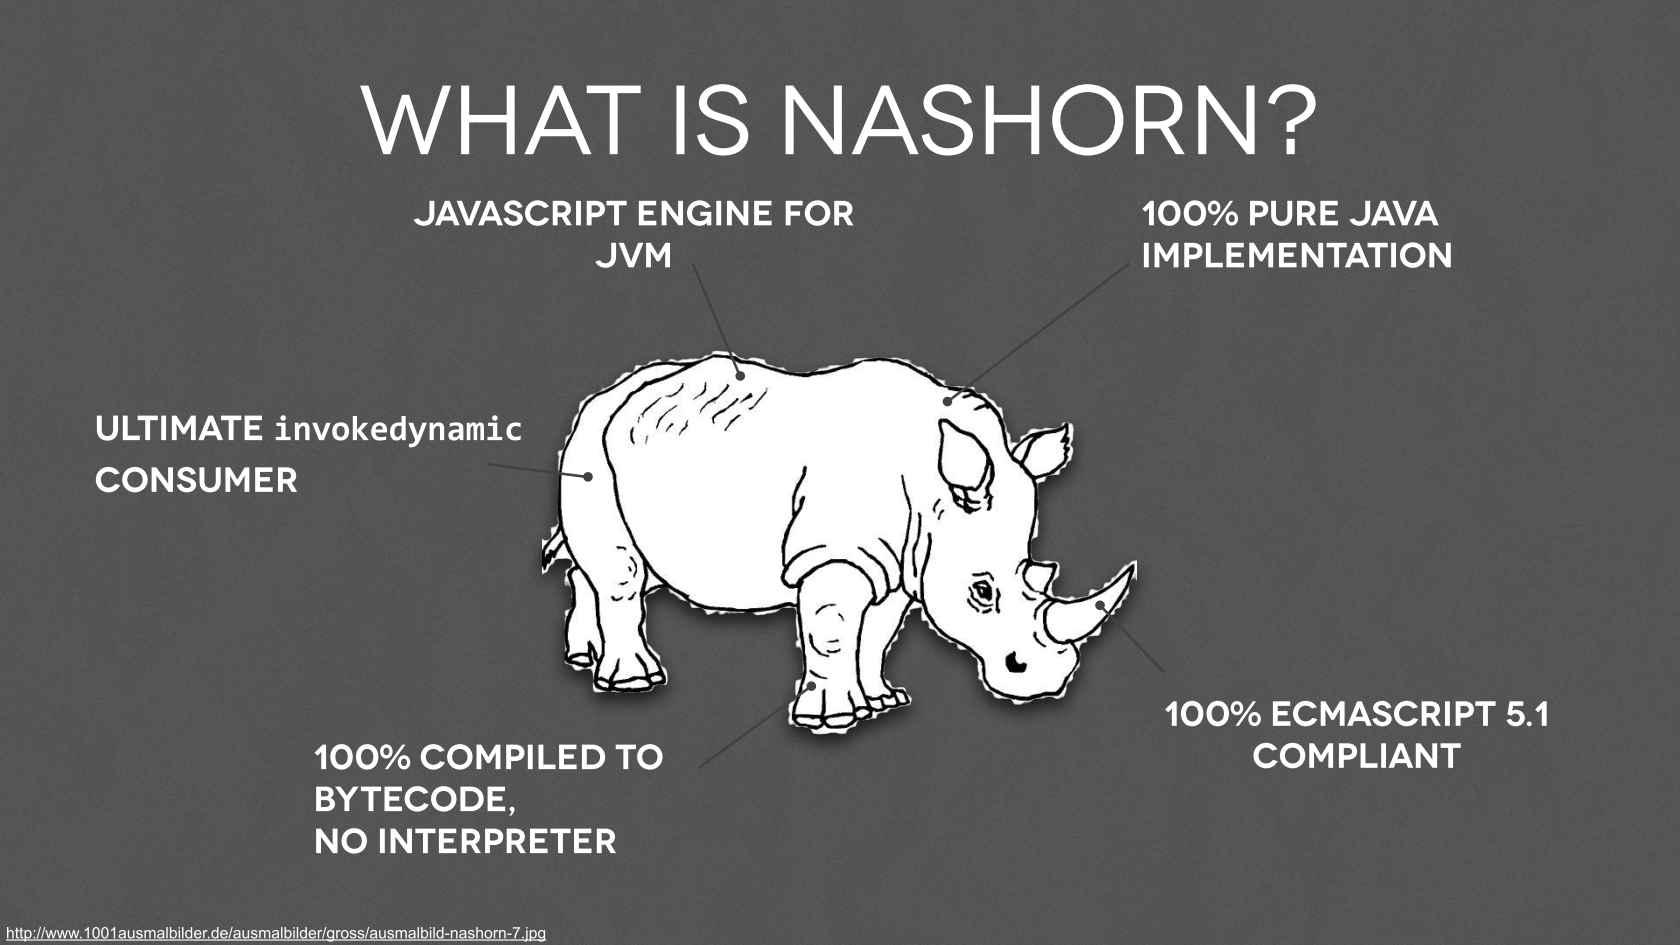 Nashorn - Native JavaScript Support in Java 8